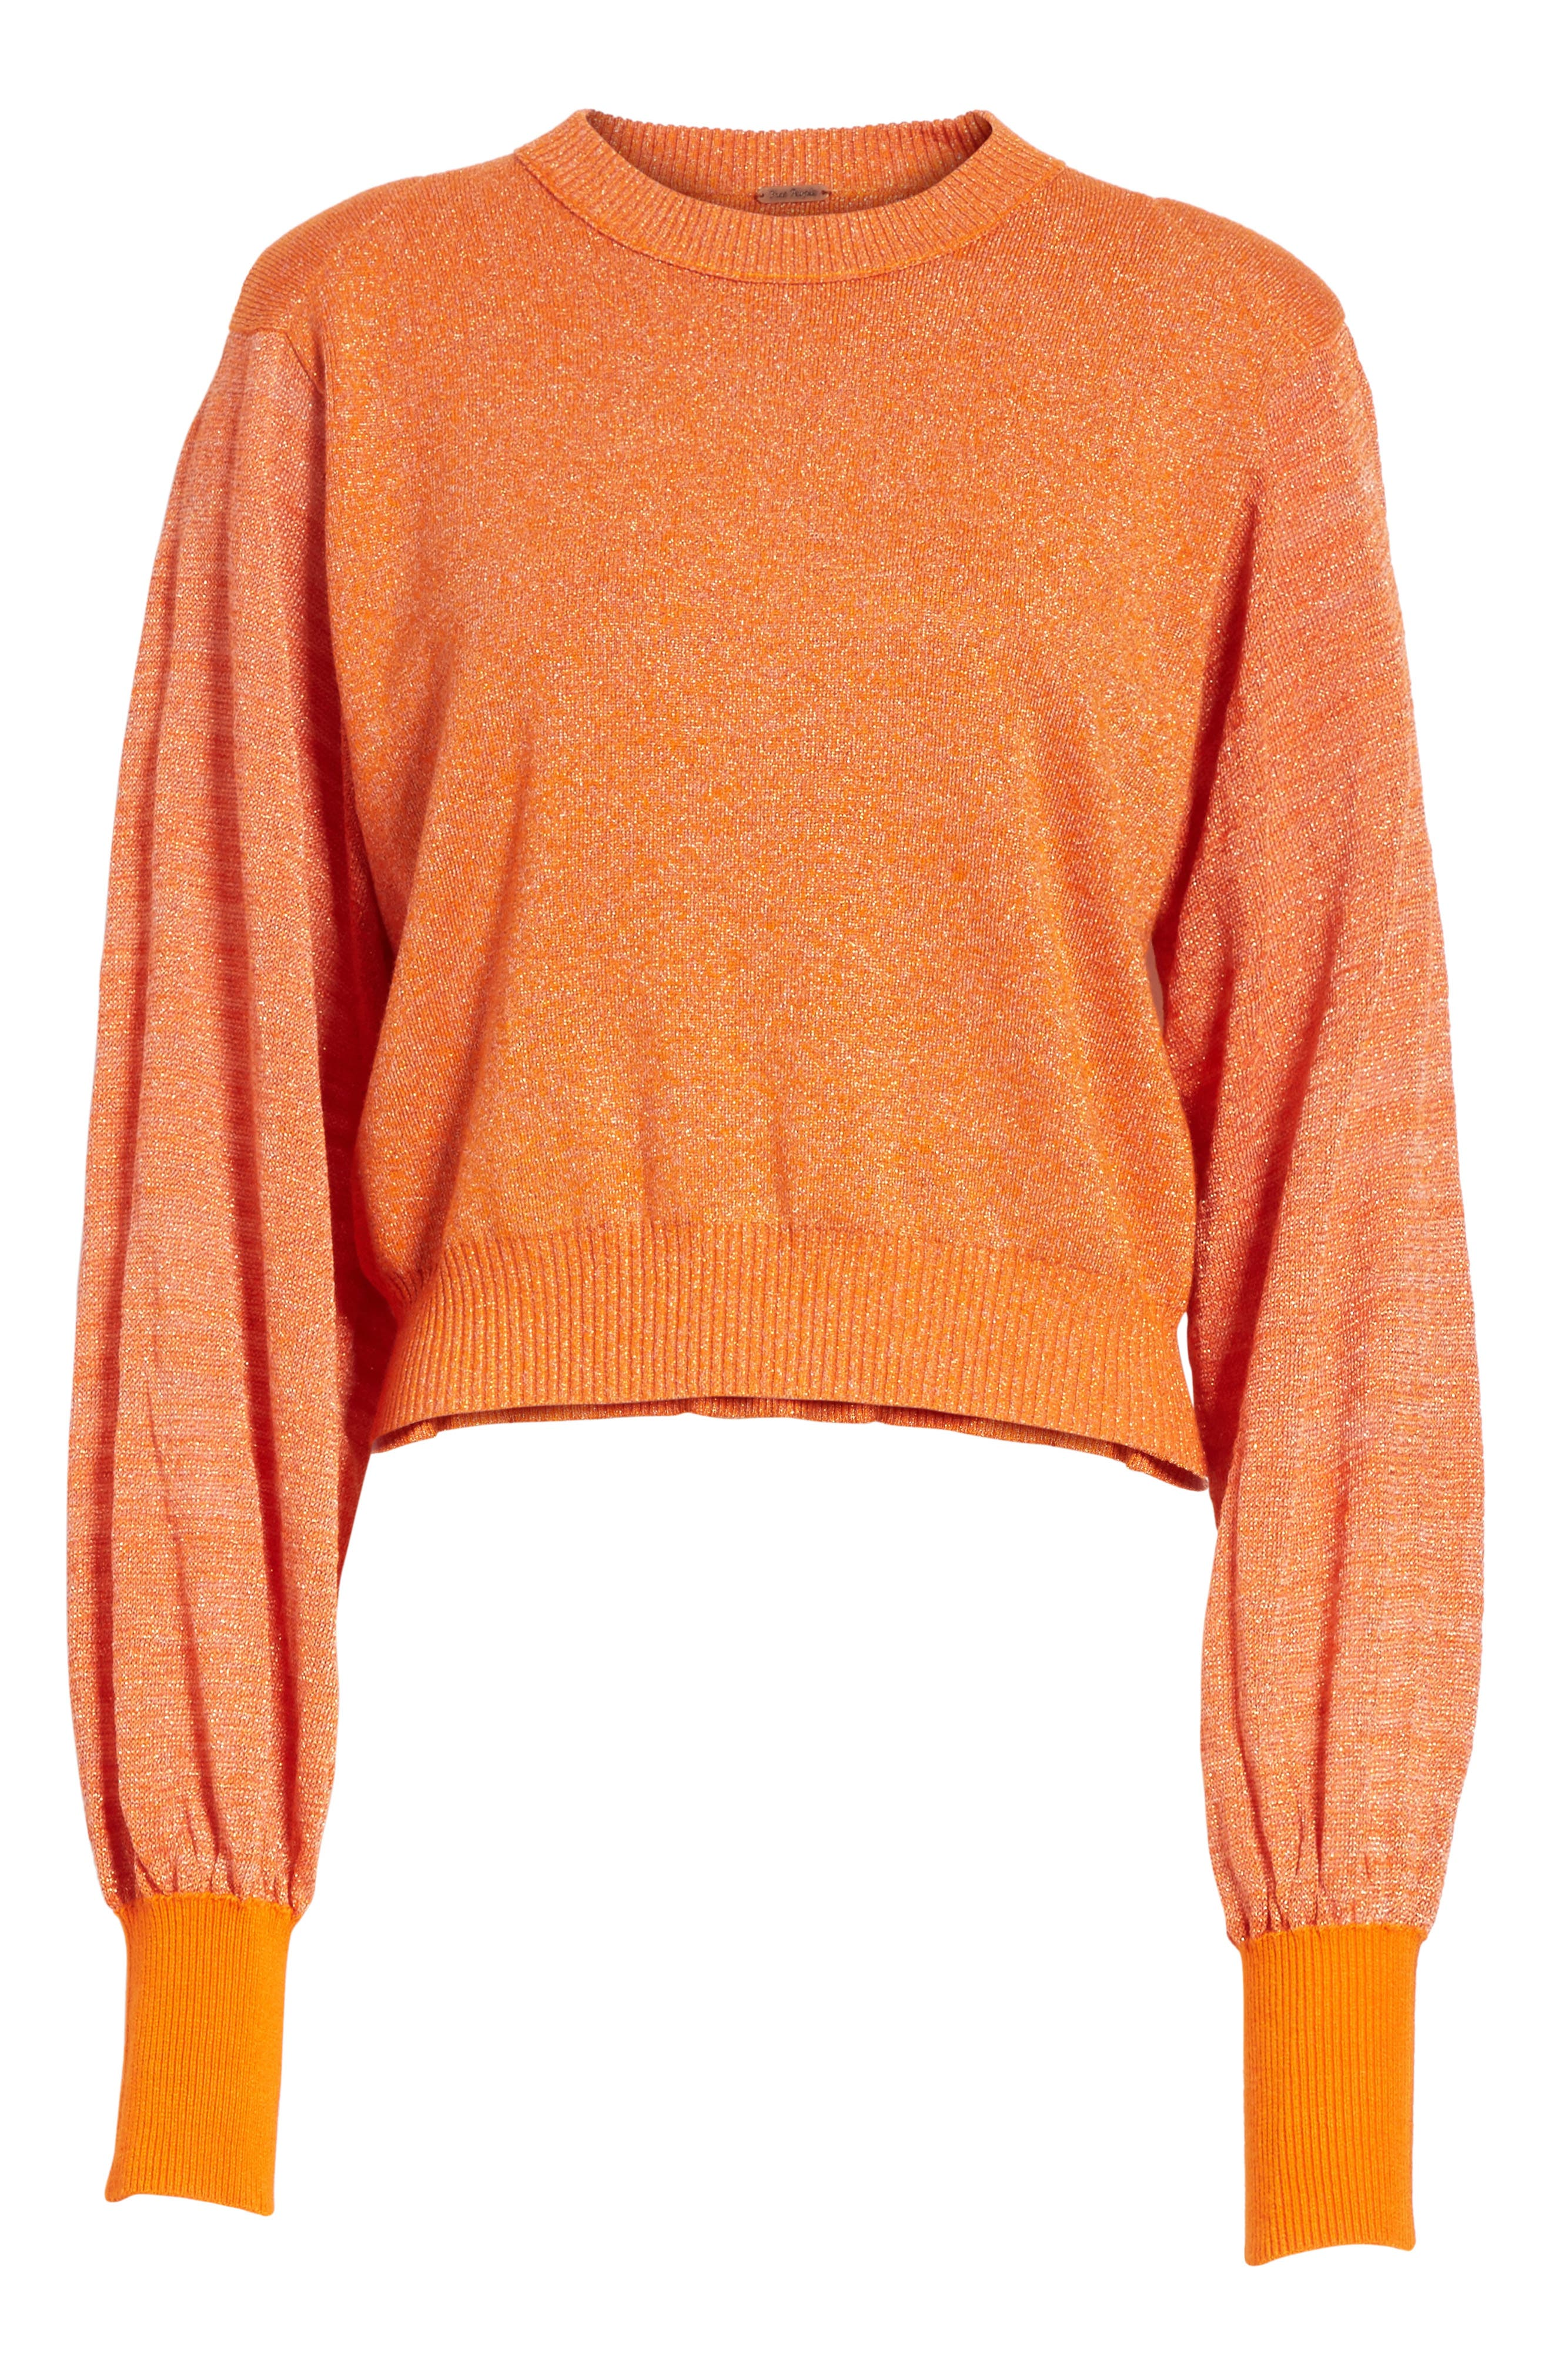 Let it Shine Sweater,                             Alternate thumbnail 18, color,